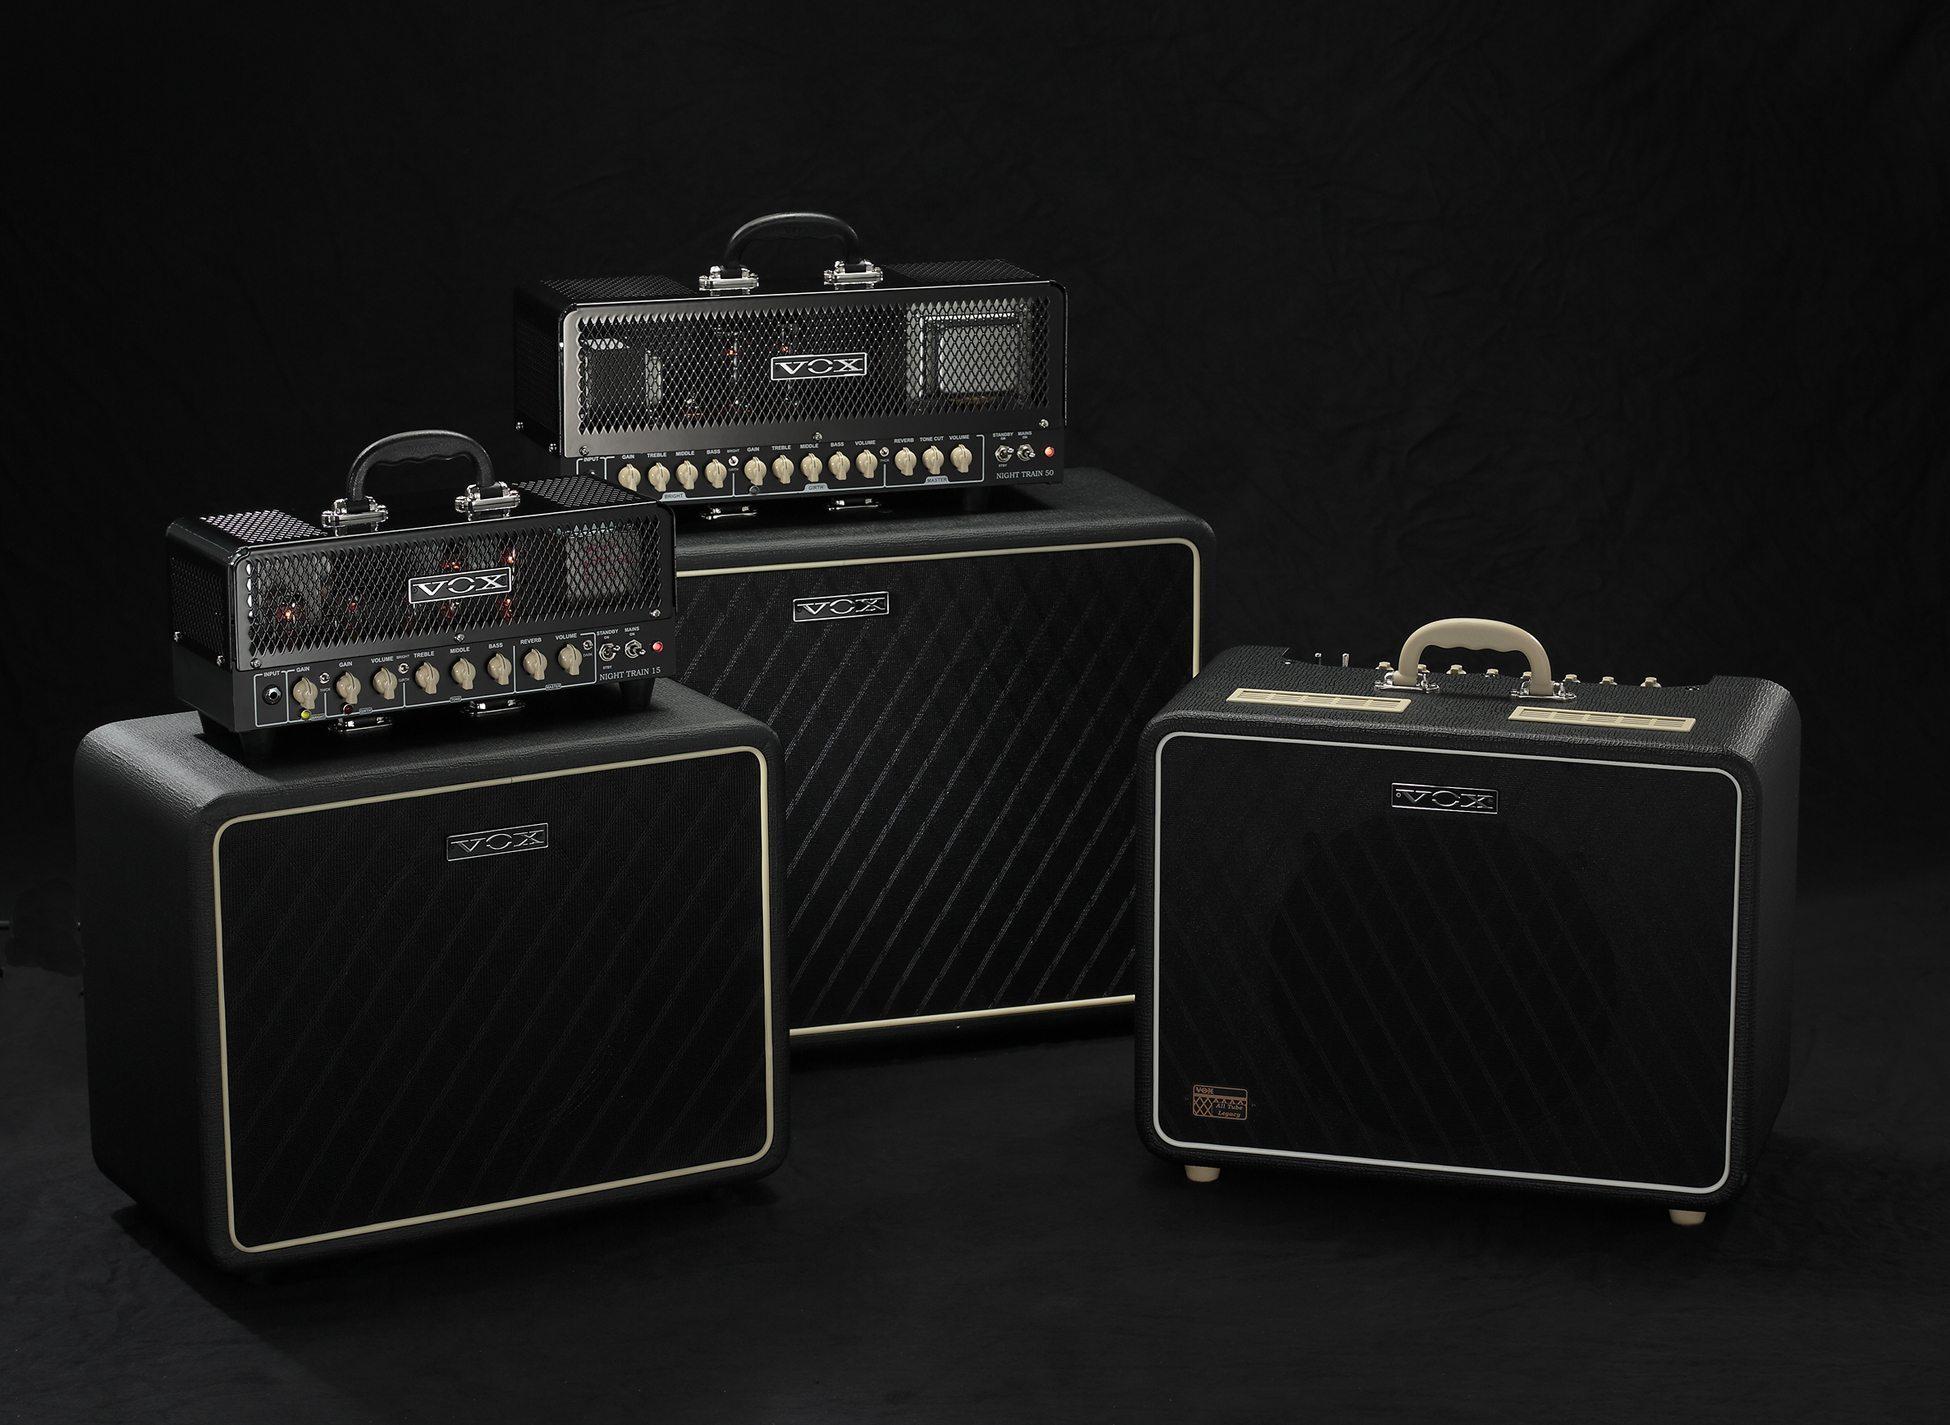 namm 2014 vox night train g2 ac15c1 soundbox mini guitar amplifiers the tone king. Black Bedroom Furniture Sets. Home Design Ideas